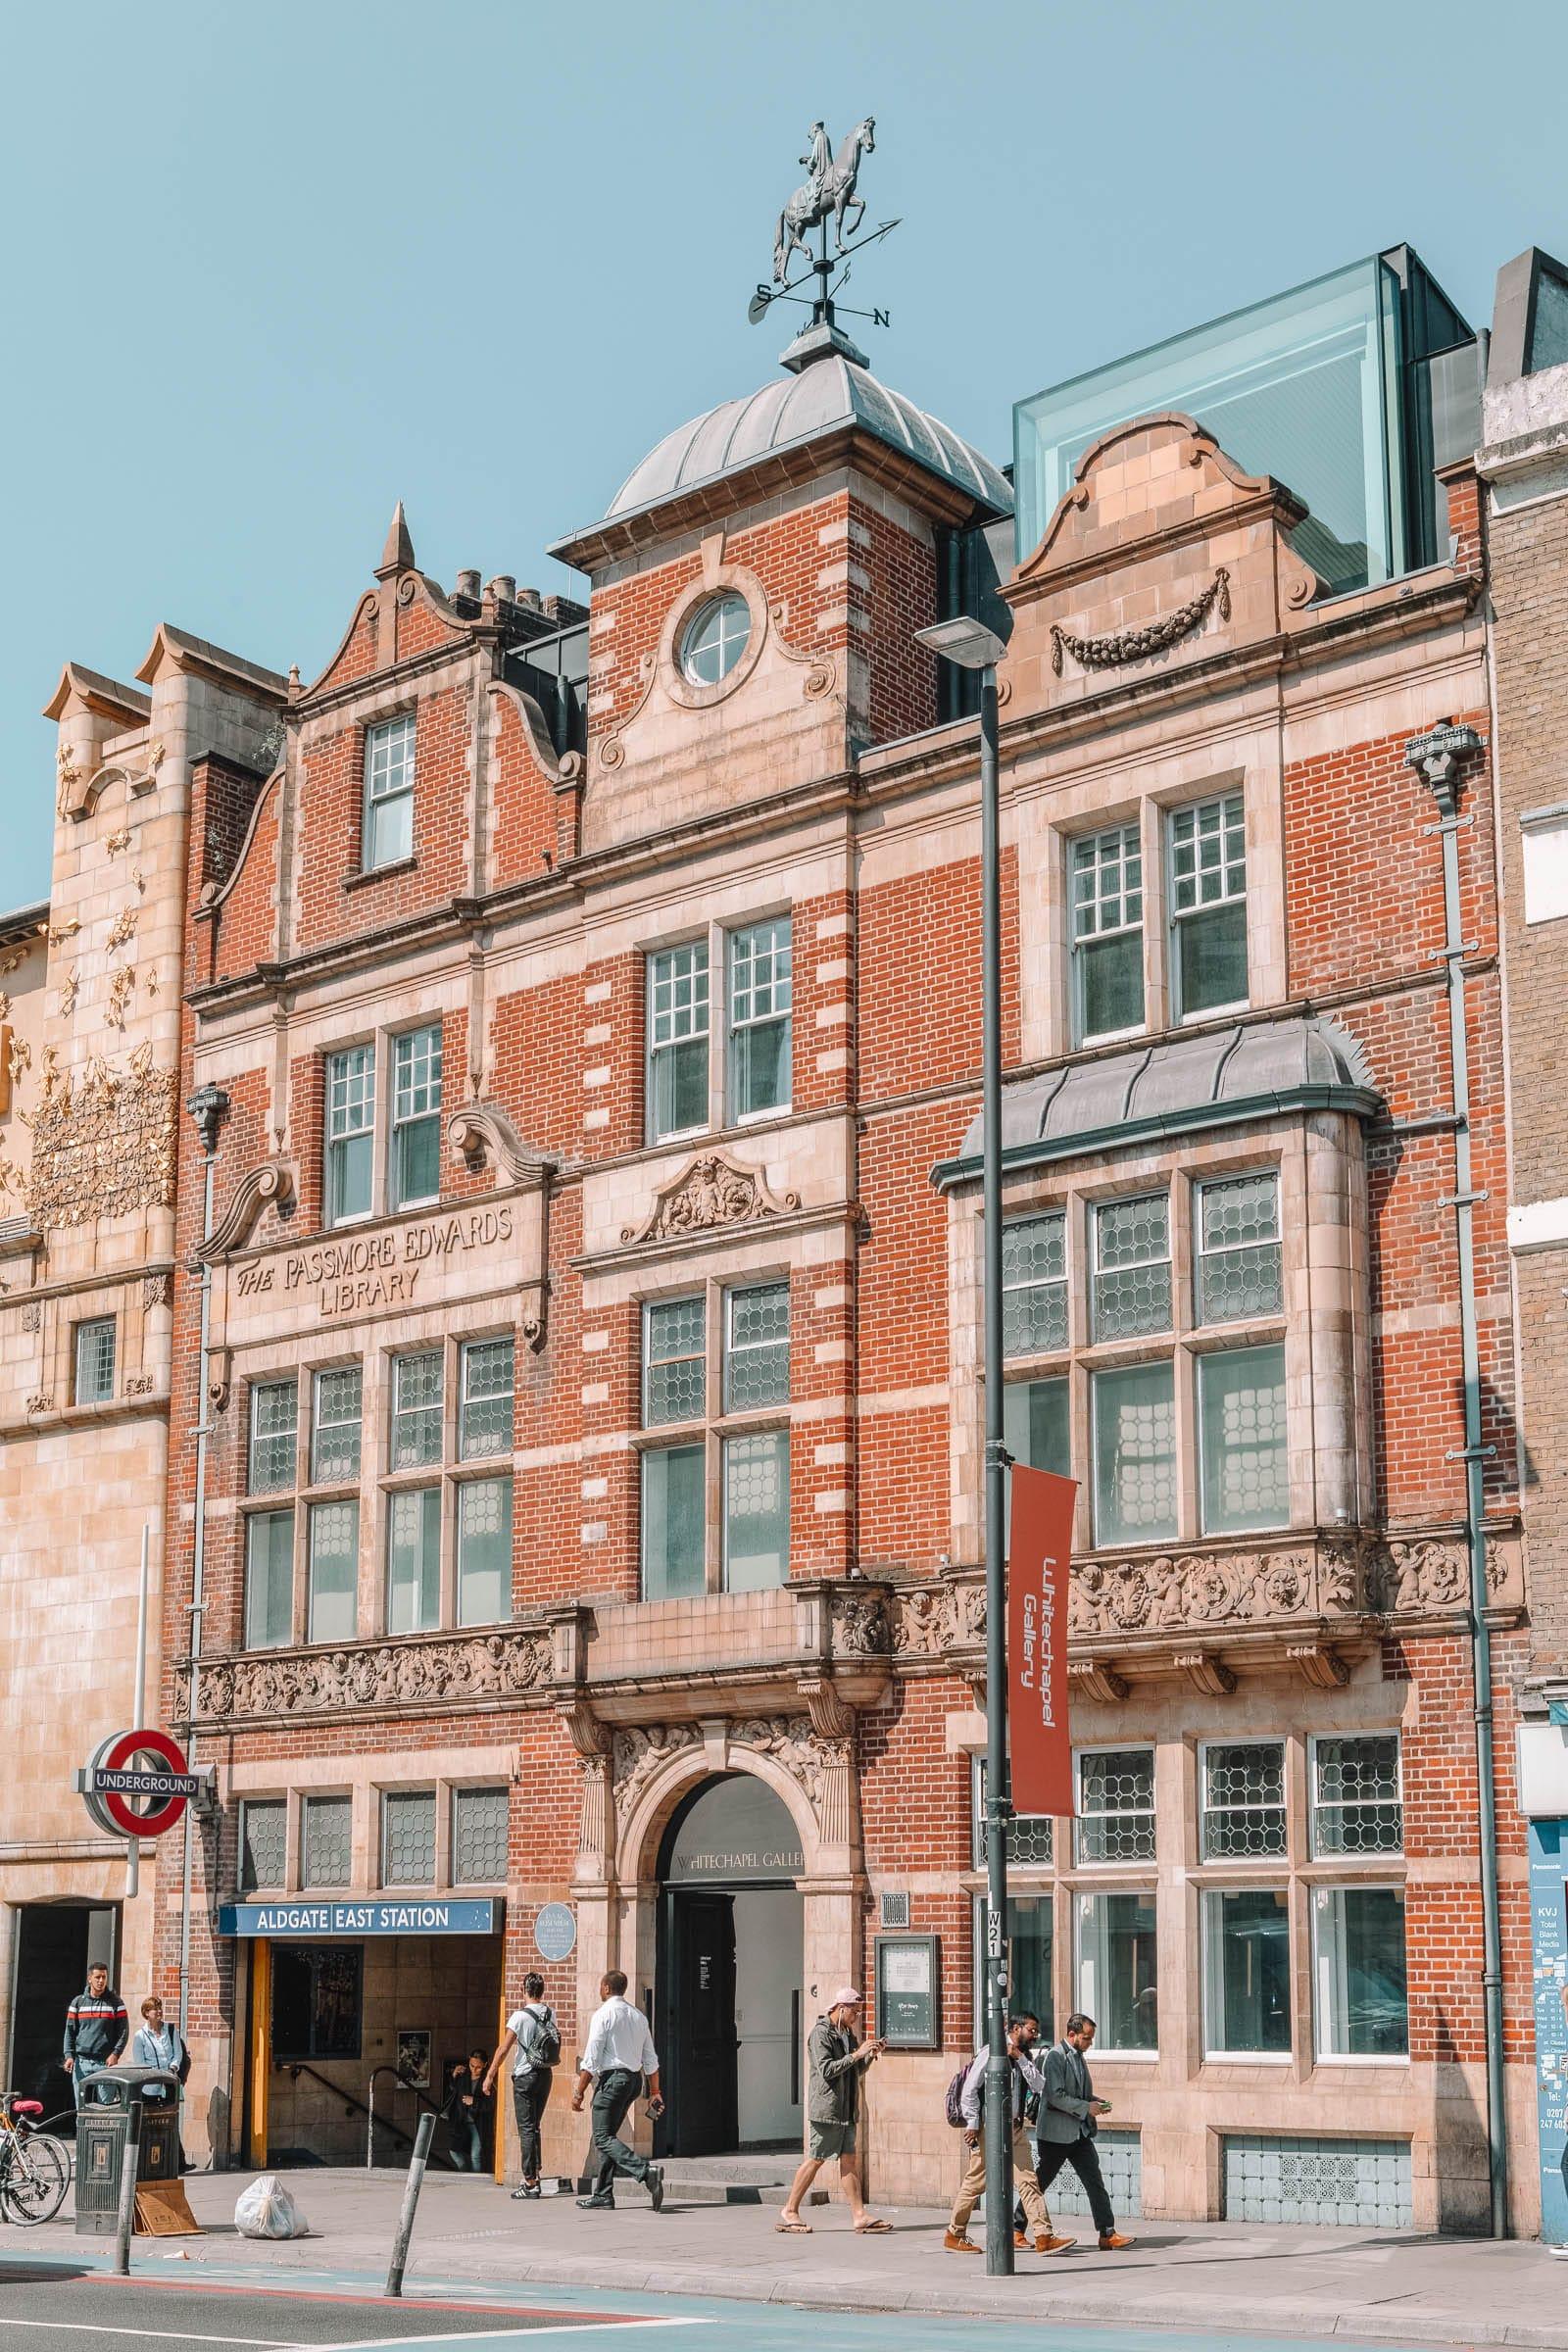 10 Best Things To Do In Whitechapel - London (5)